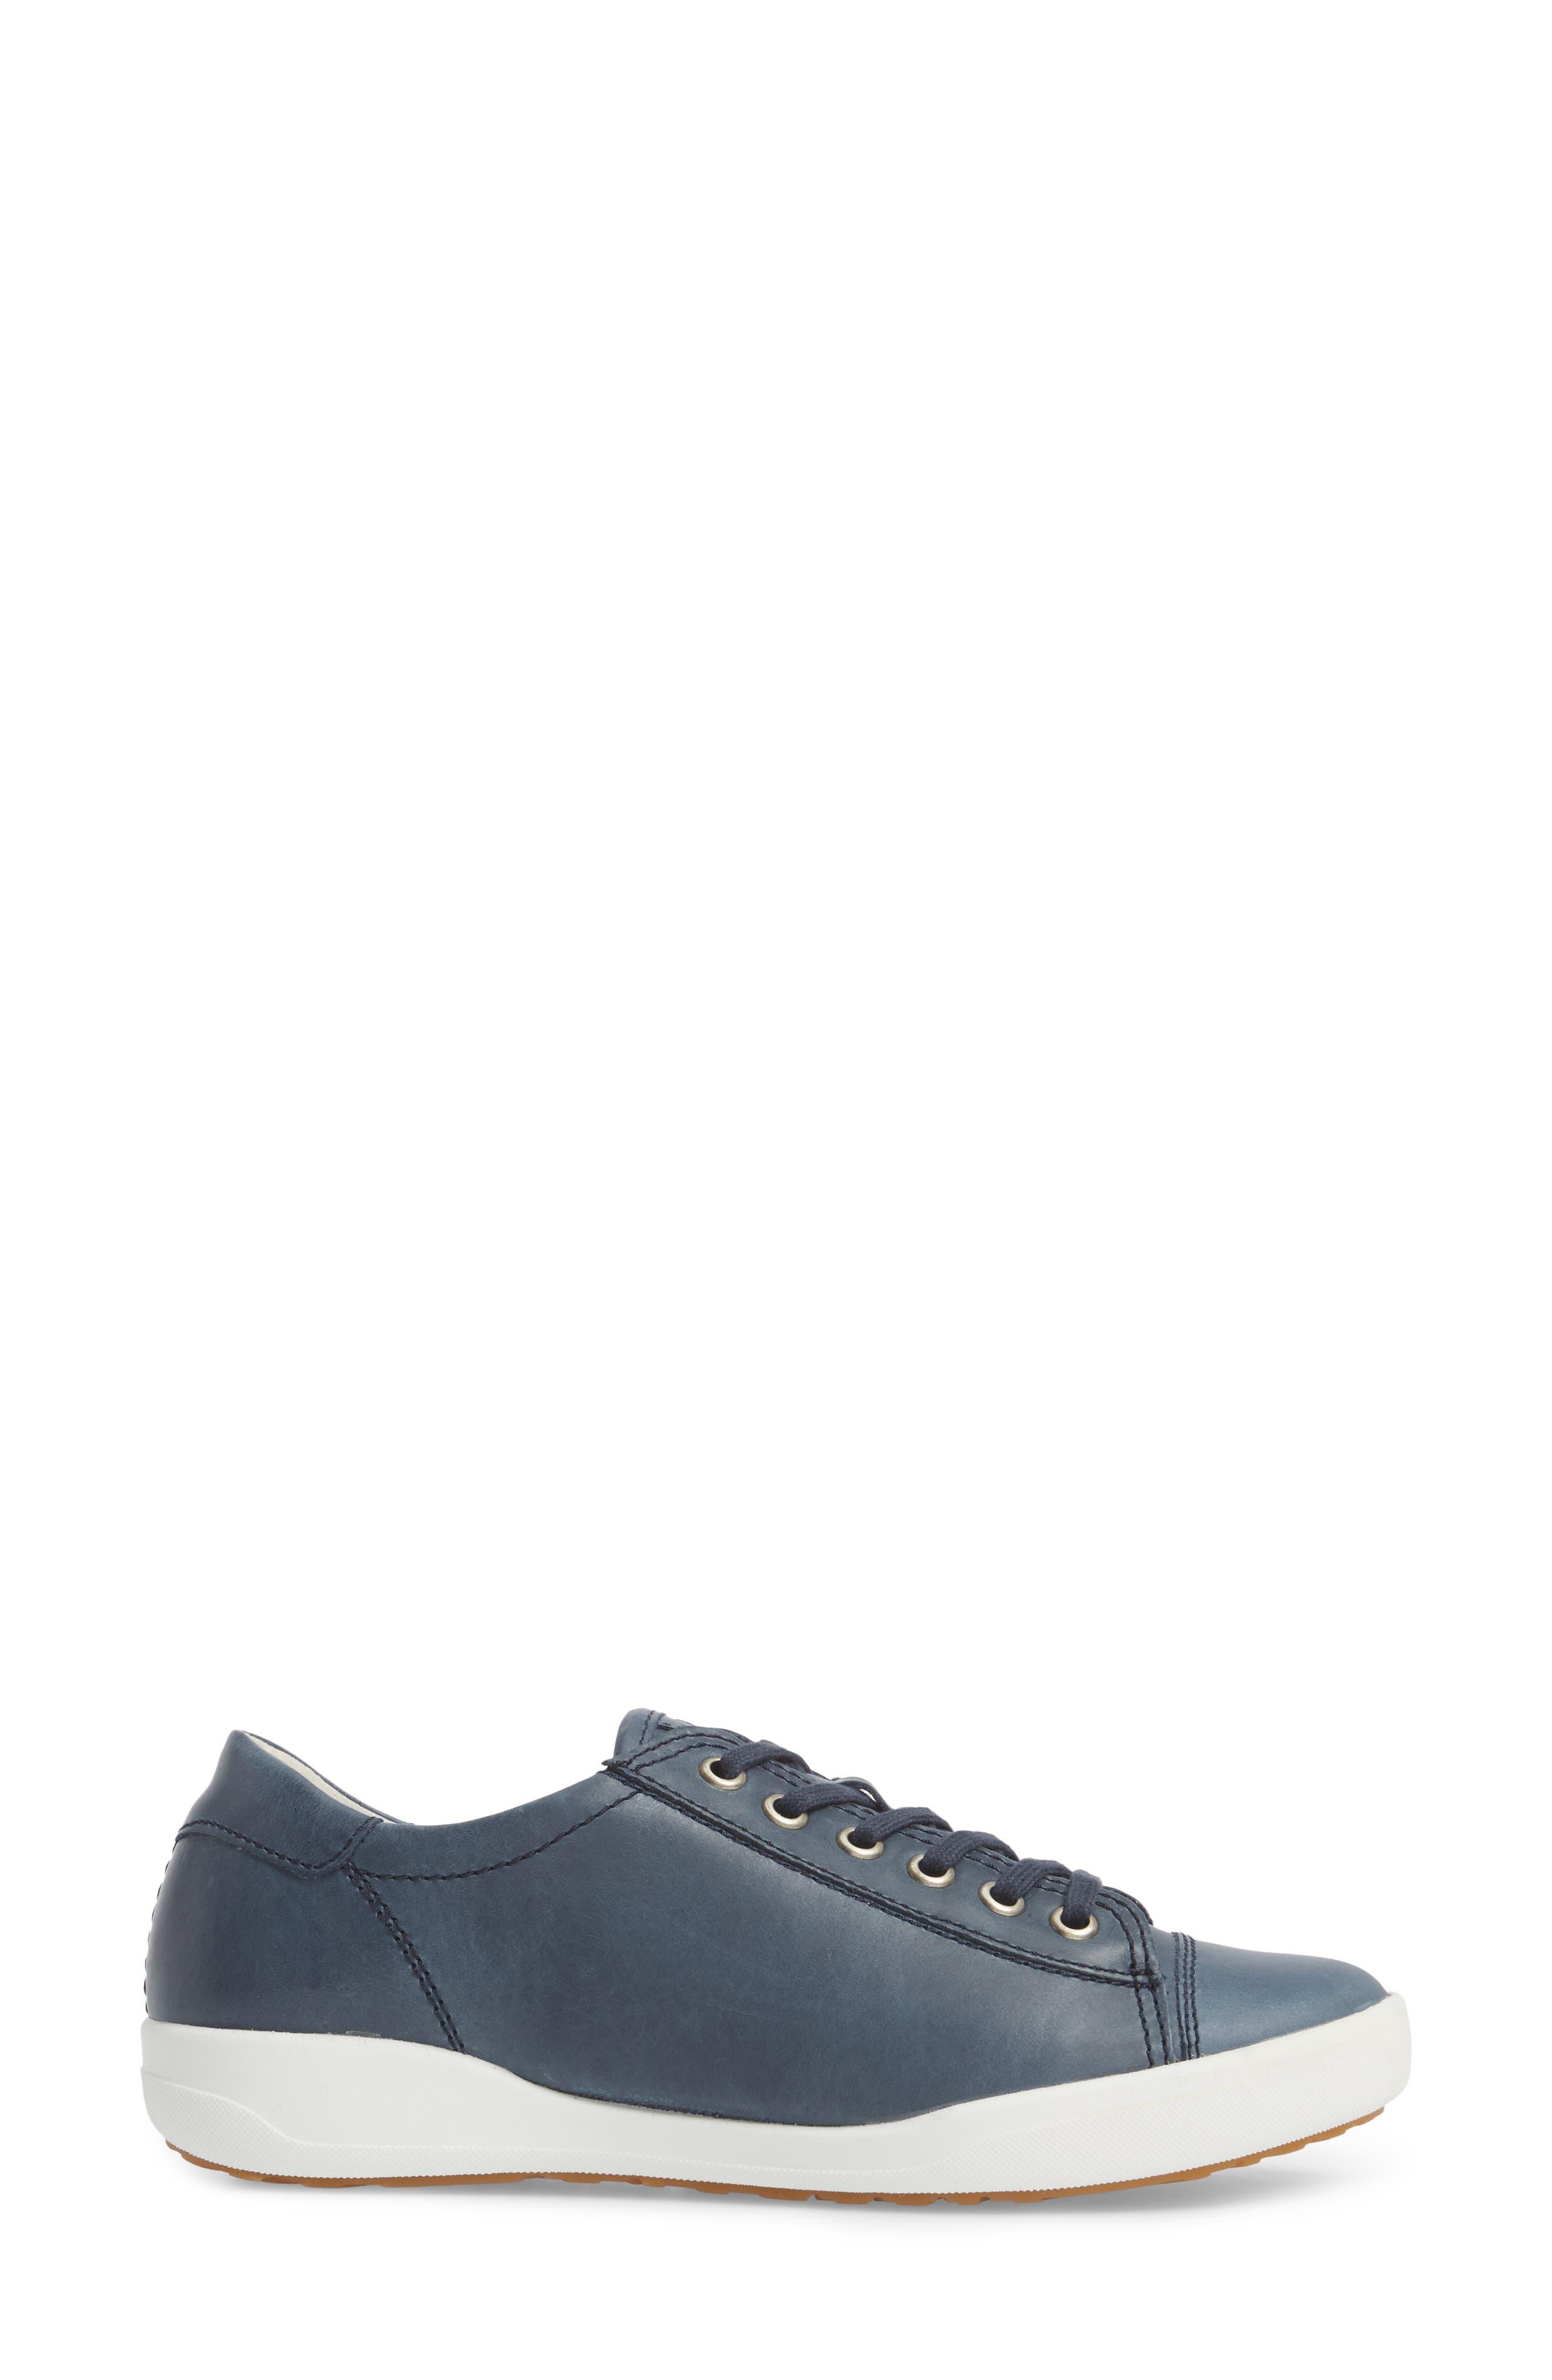 Alternate Image 3  - Josef Seibel Sina 11 Sneaker (Women)